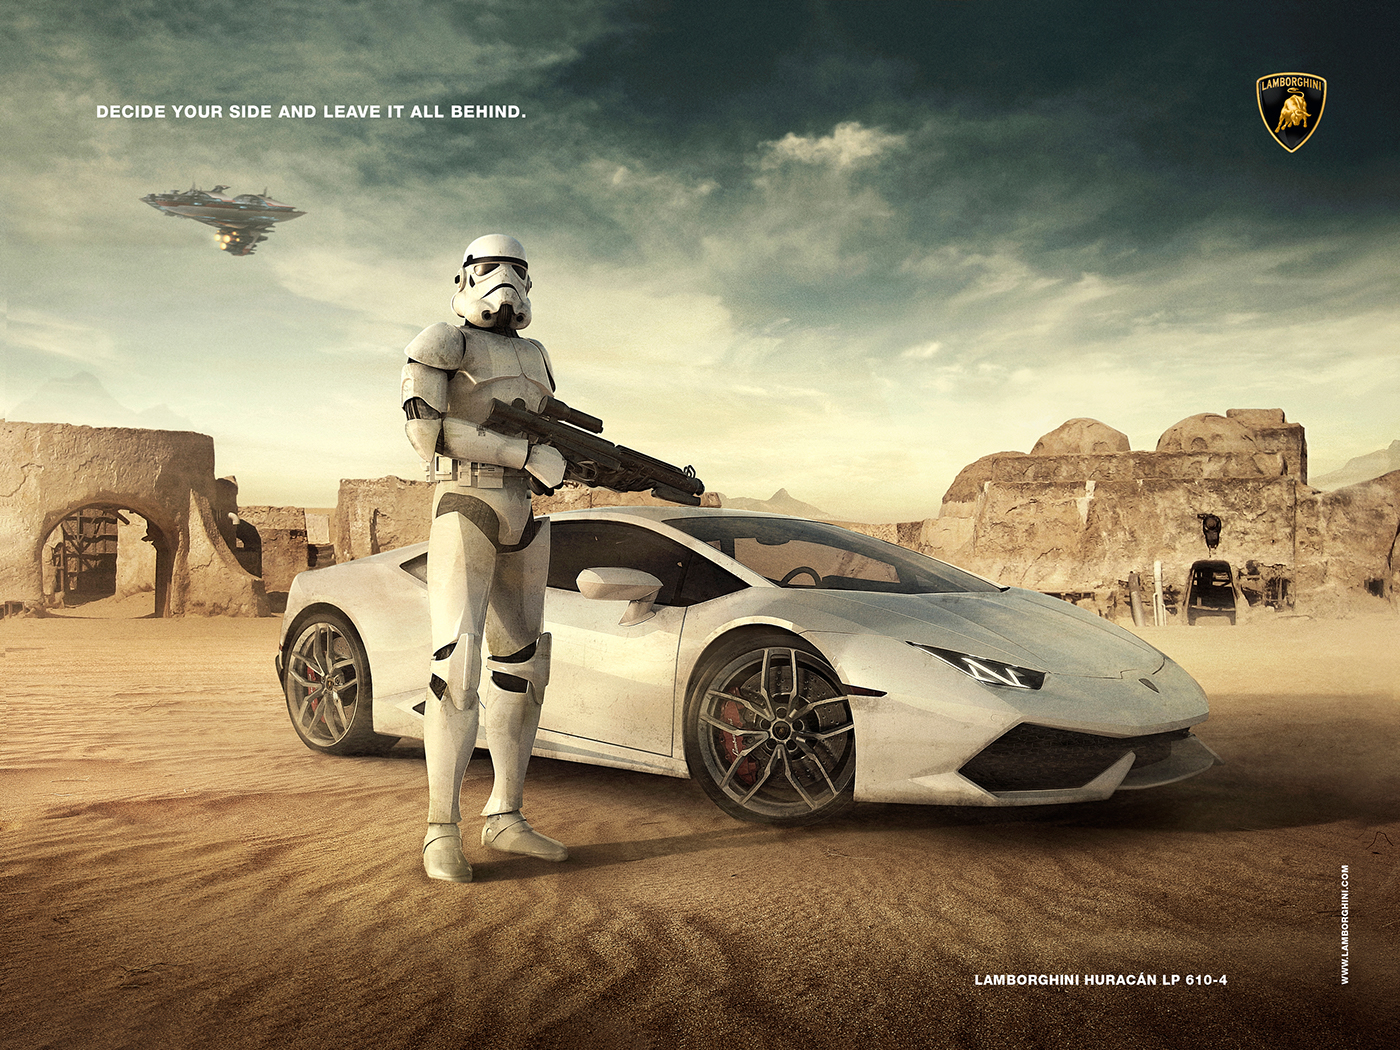 Lamborghini Advertising Stormtrooper On Behance